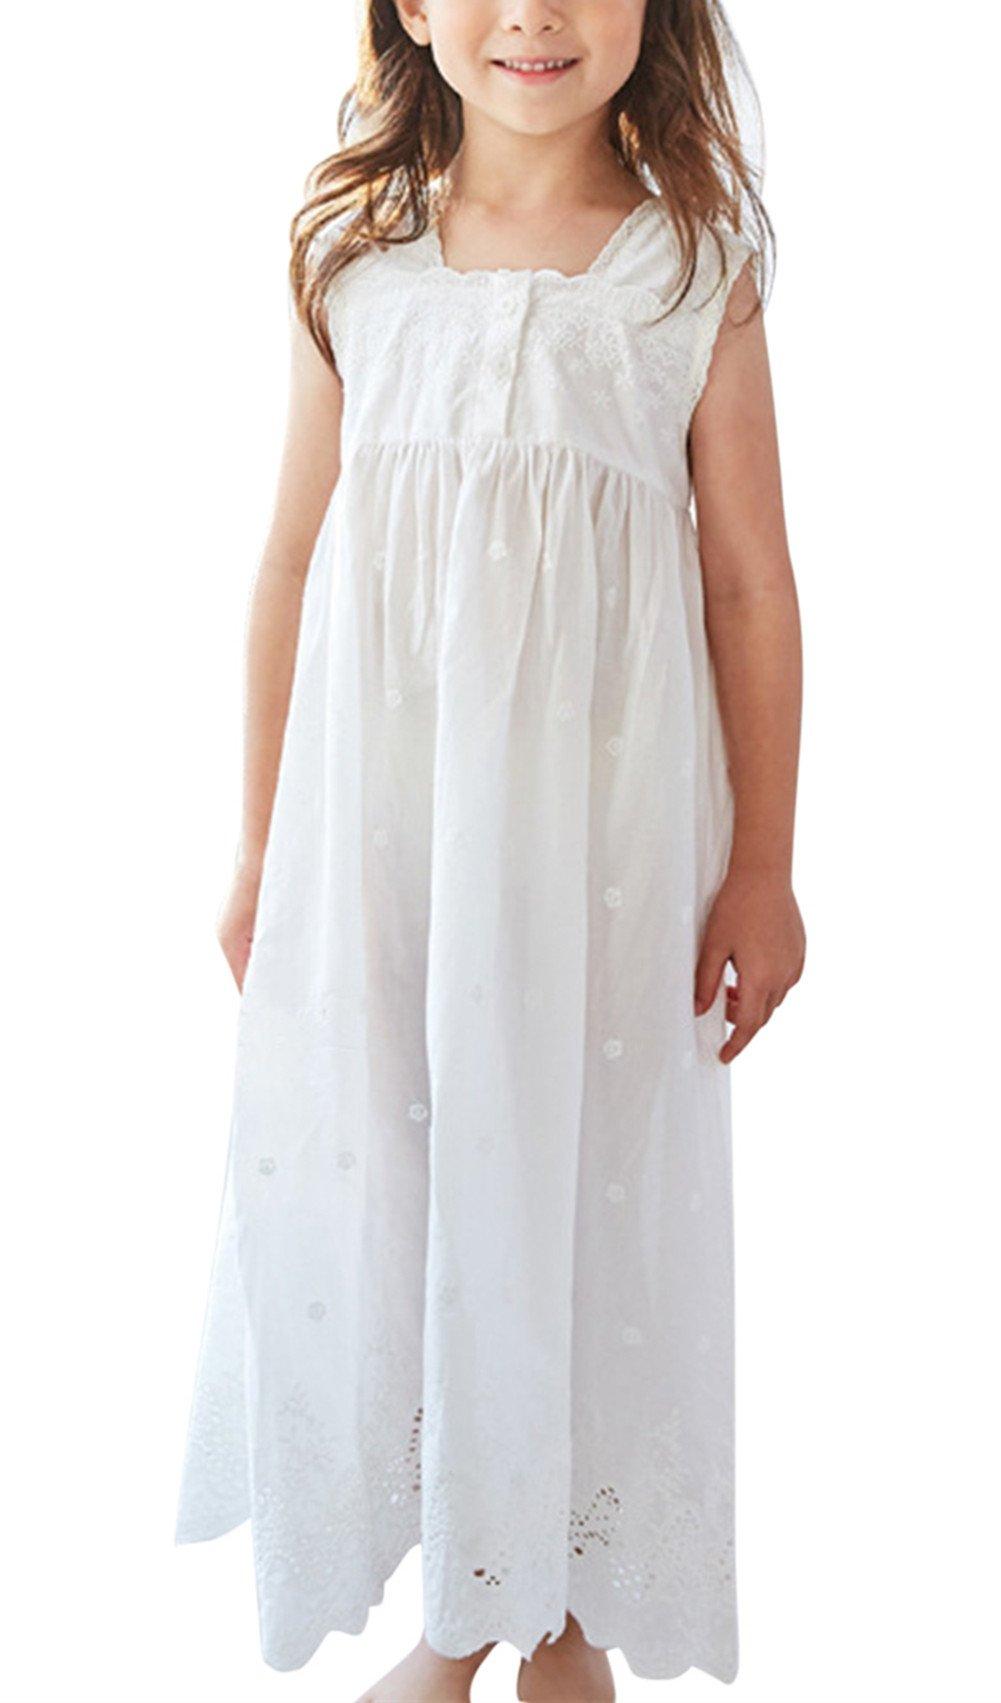 Aulase Kids Girls' Retro Lace Sleeveless Full Length Princess Dress White 3-4Y/Tag 110cm